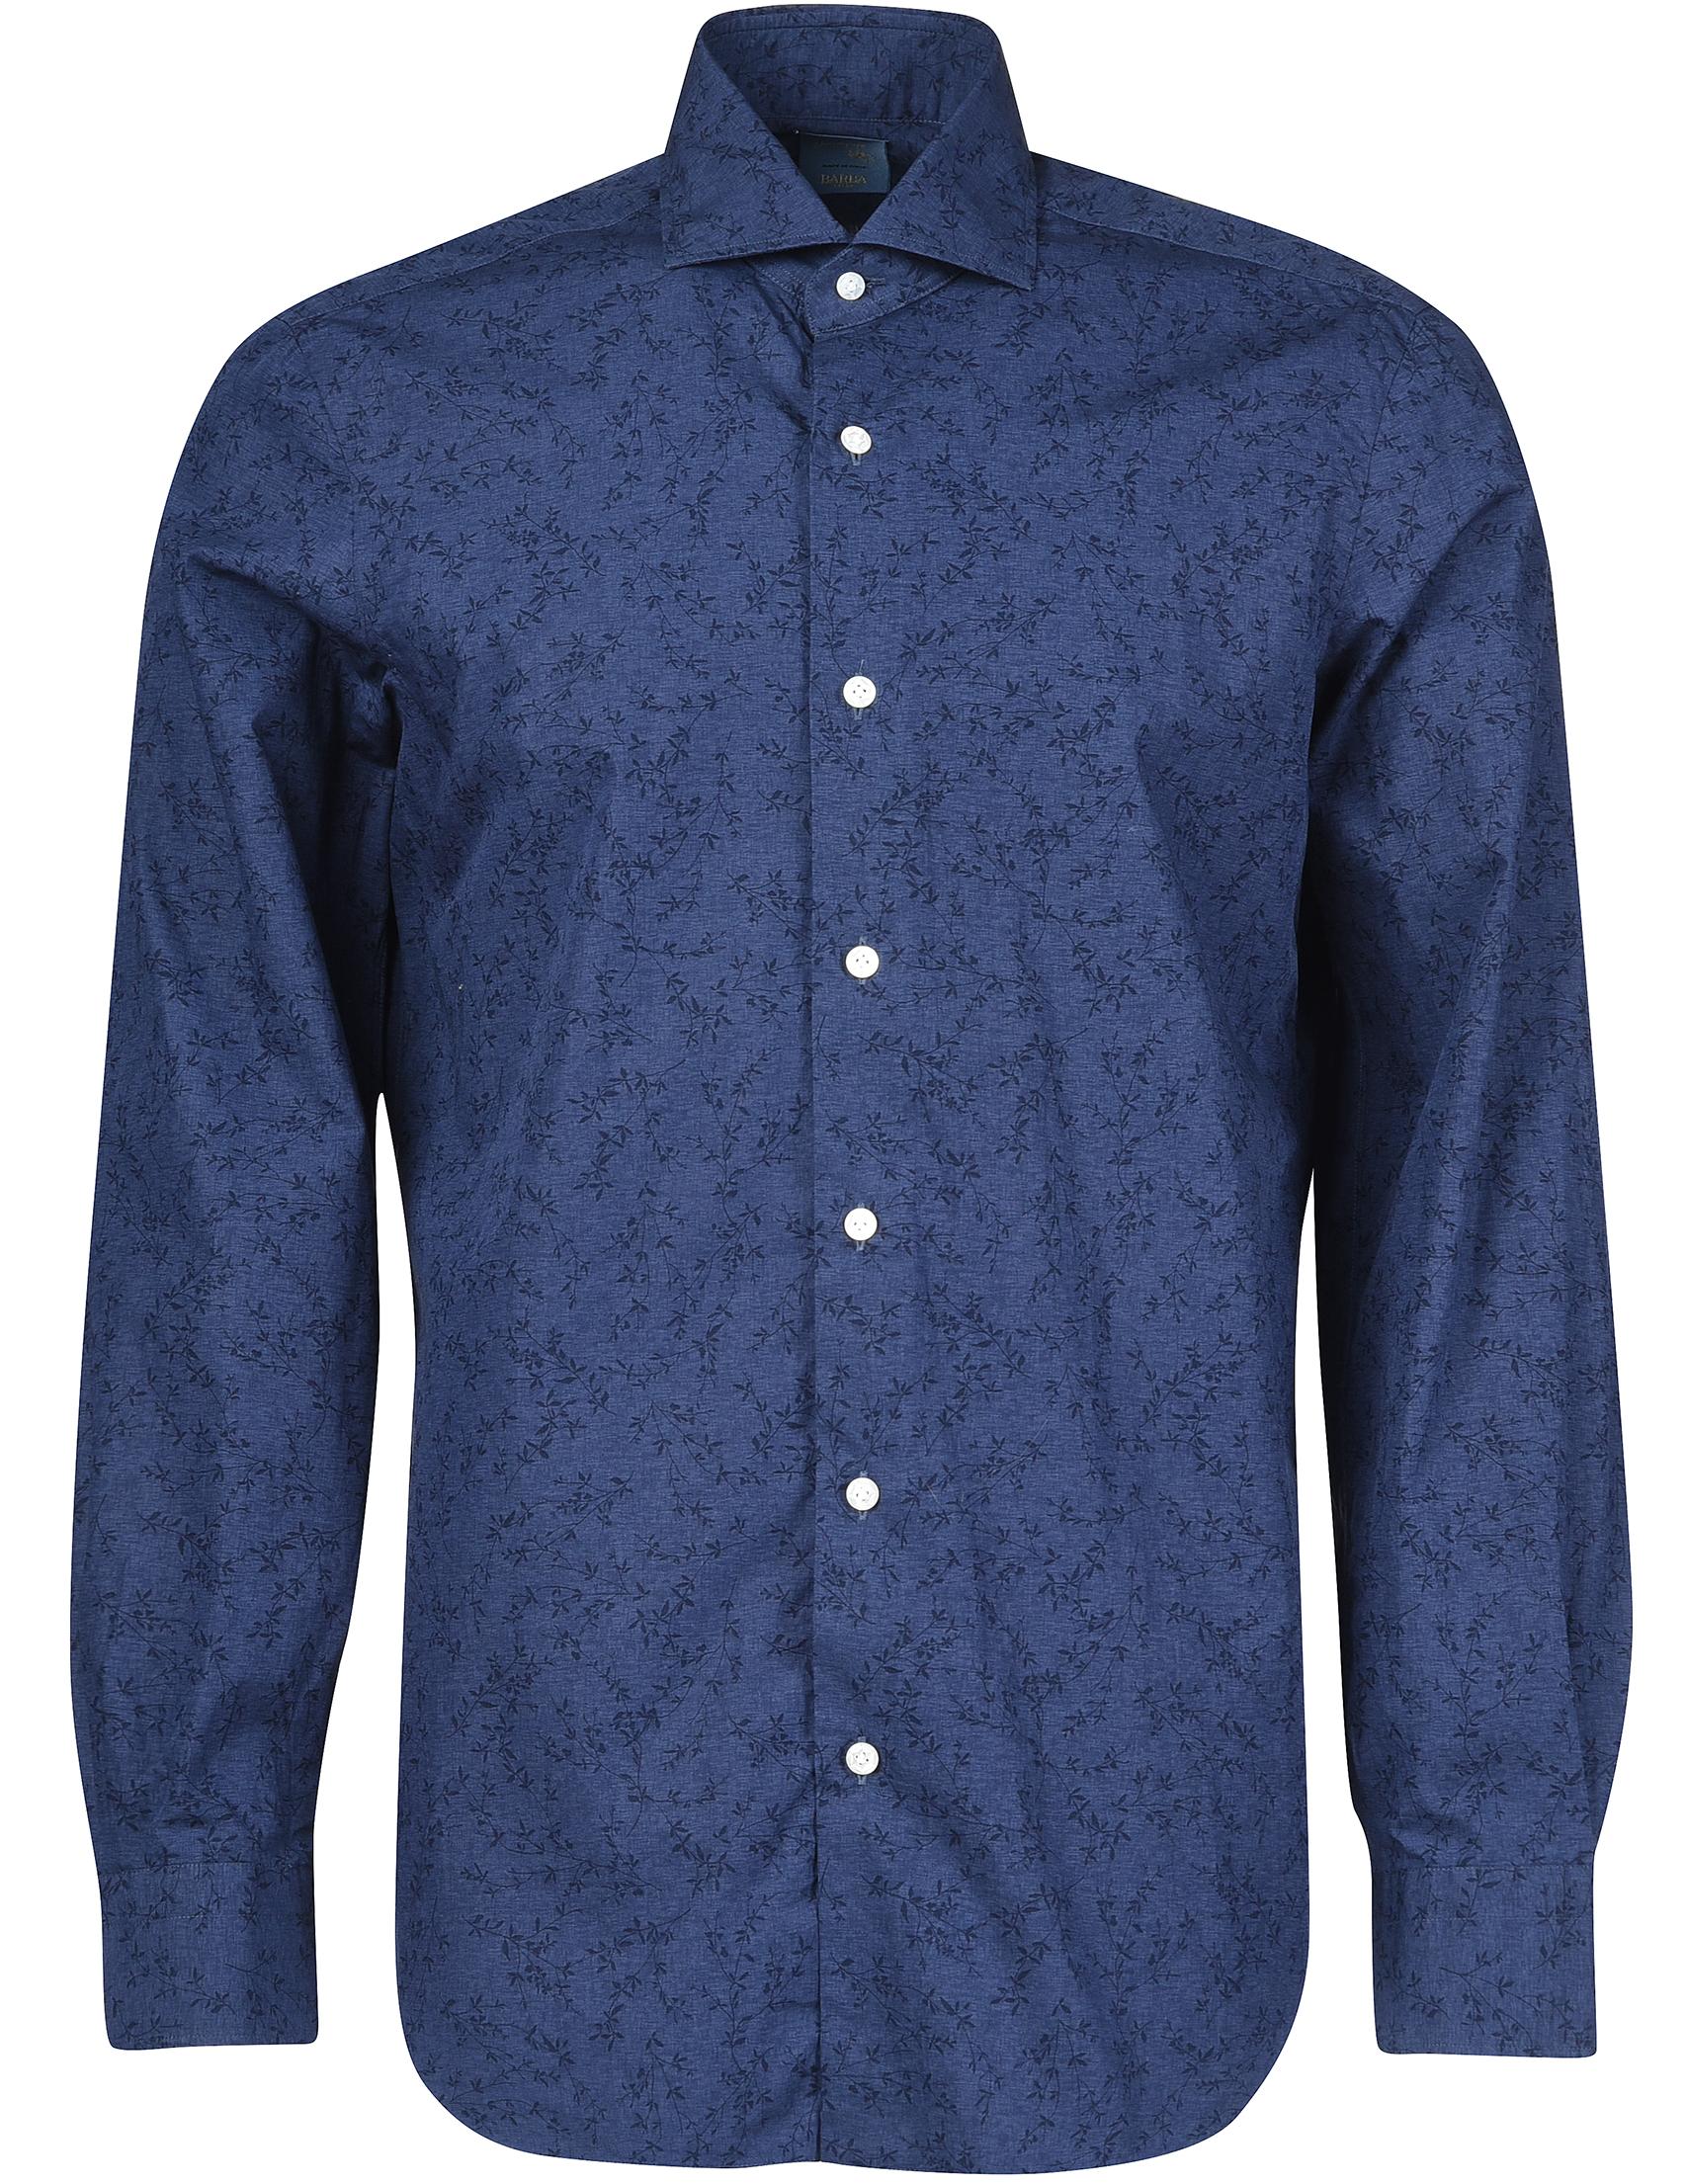 7f9dfc029acd54f Мужская рубашка BARBA NAPOLI [2019] купить в Киеве, Одессе, Украине